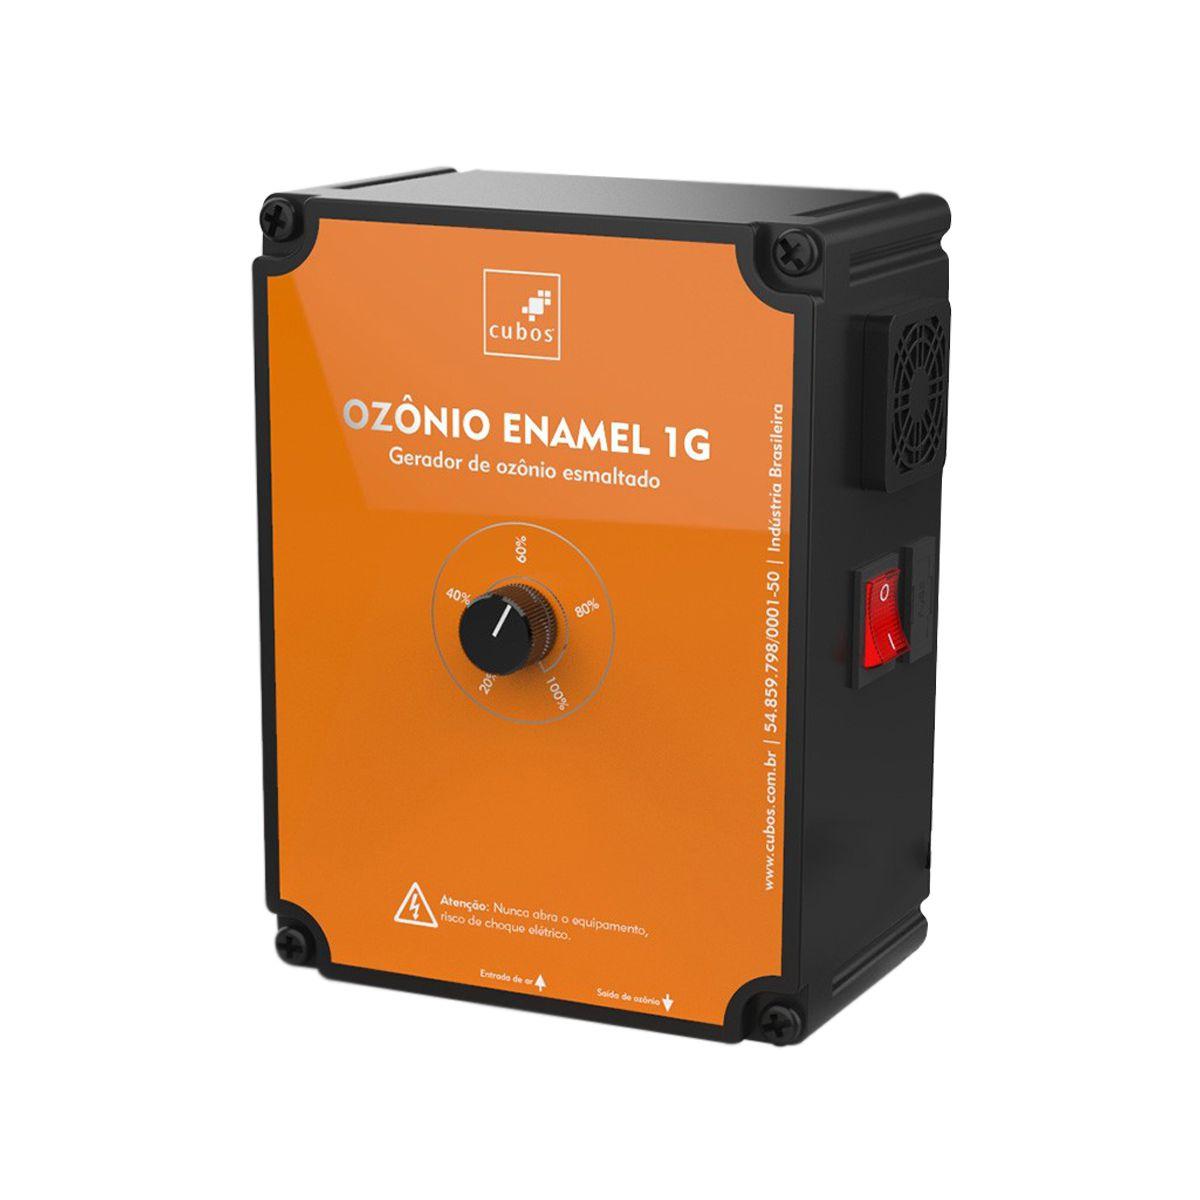 Gerador de Ozônio Cubos Enamel 1G - de 2000 a 10000 Litros